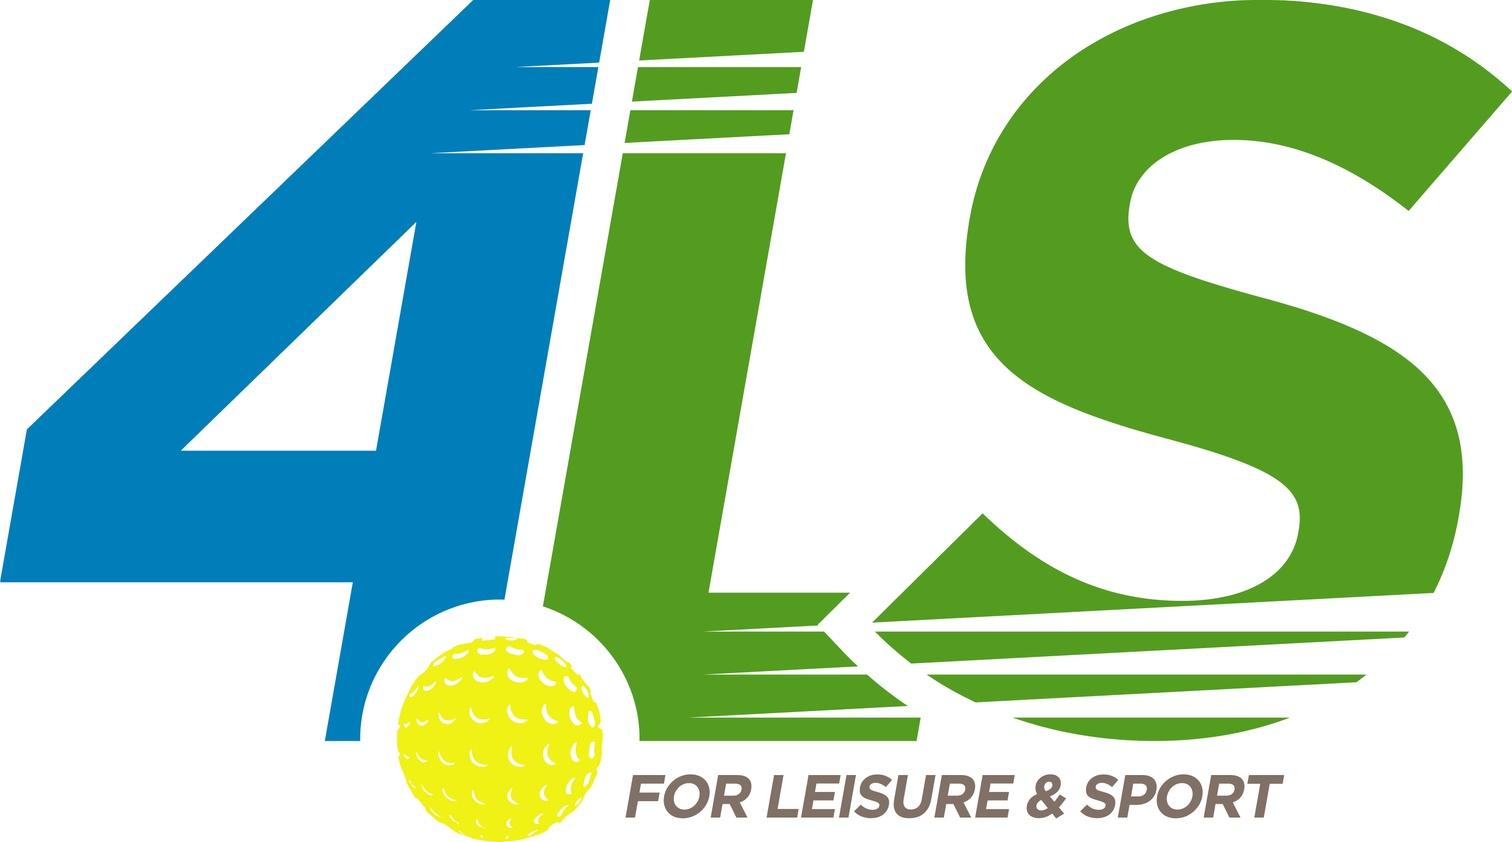 logo For Leisure & Sport